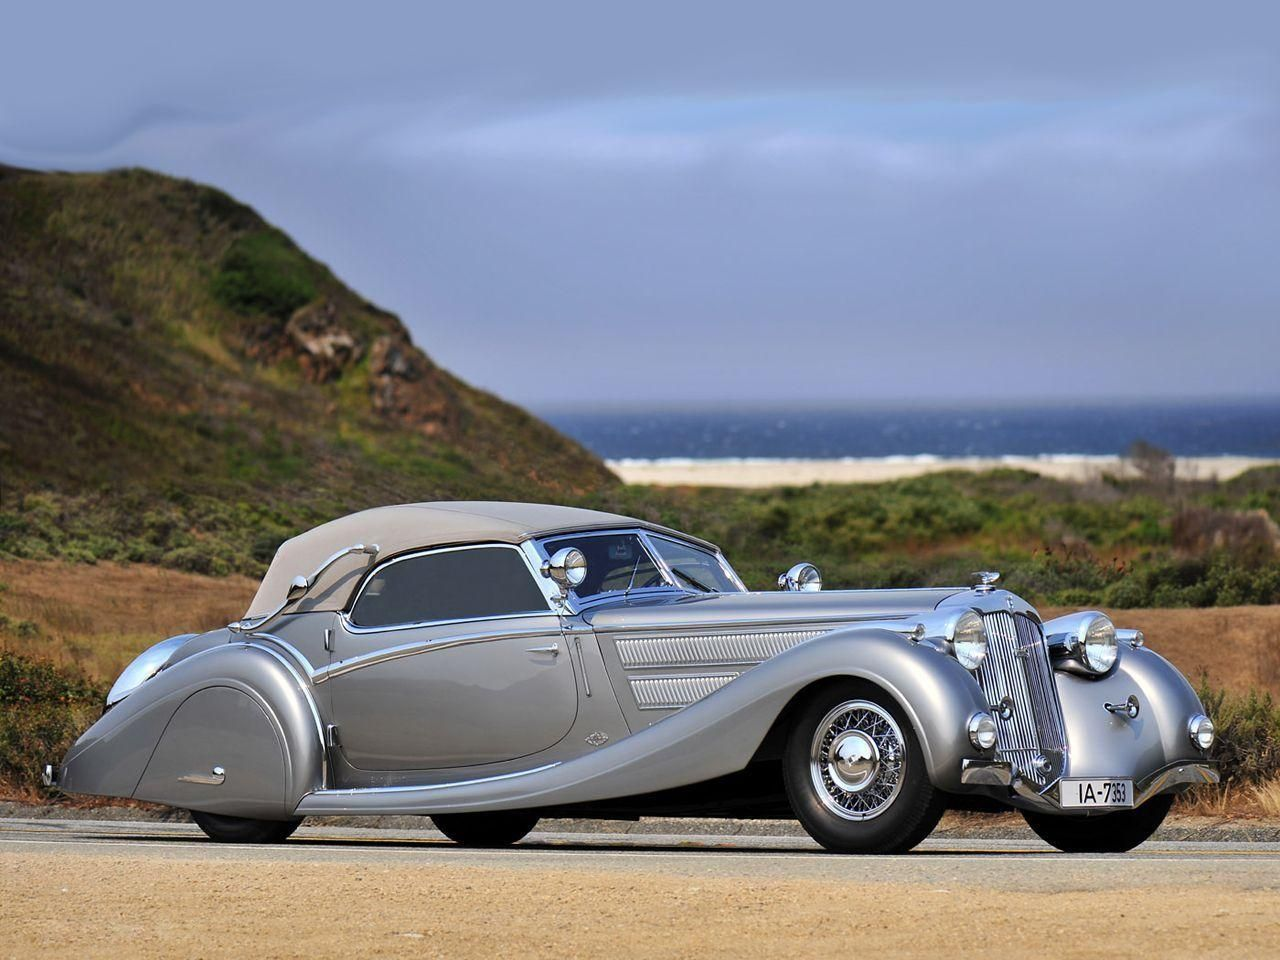 1935 Horch 853 Sport Cabriolet Horchs Vehicles Antique Cars Cars